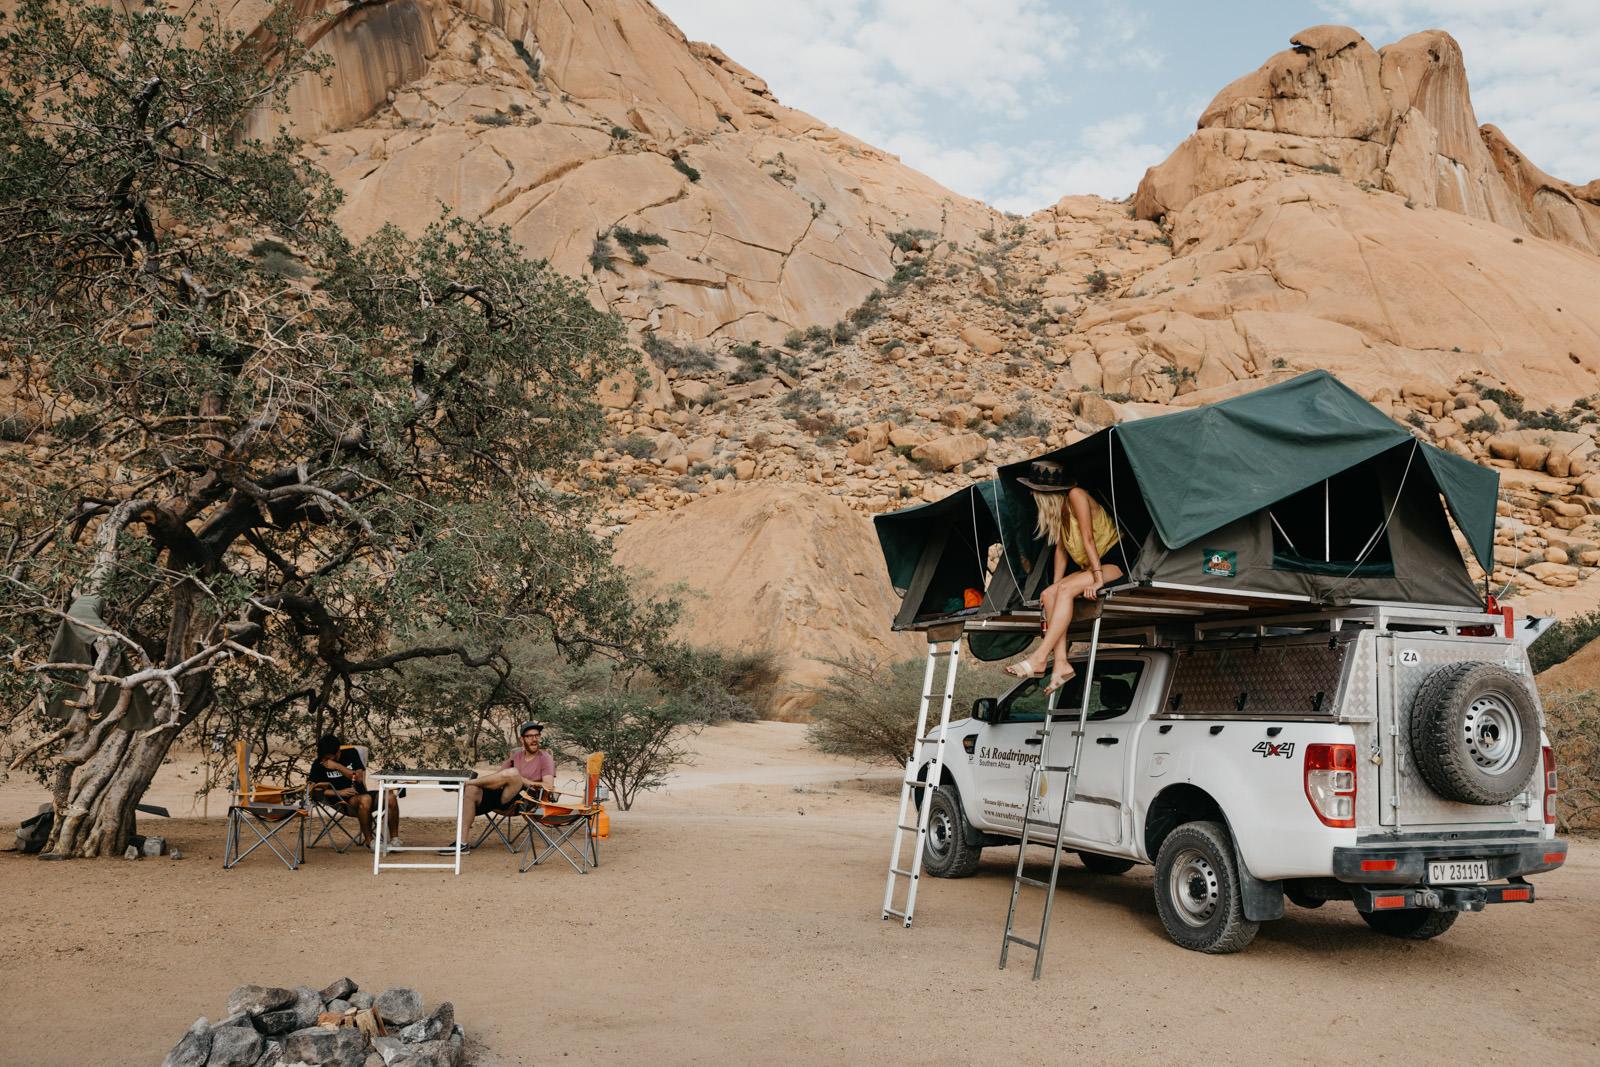 namibia_trip_rooftent_camping_roadtrip (7 von 18).jpg